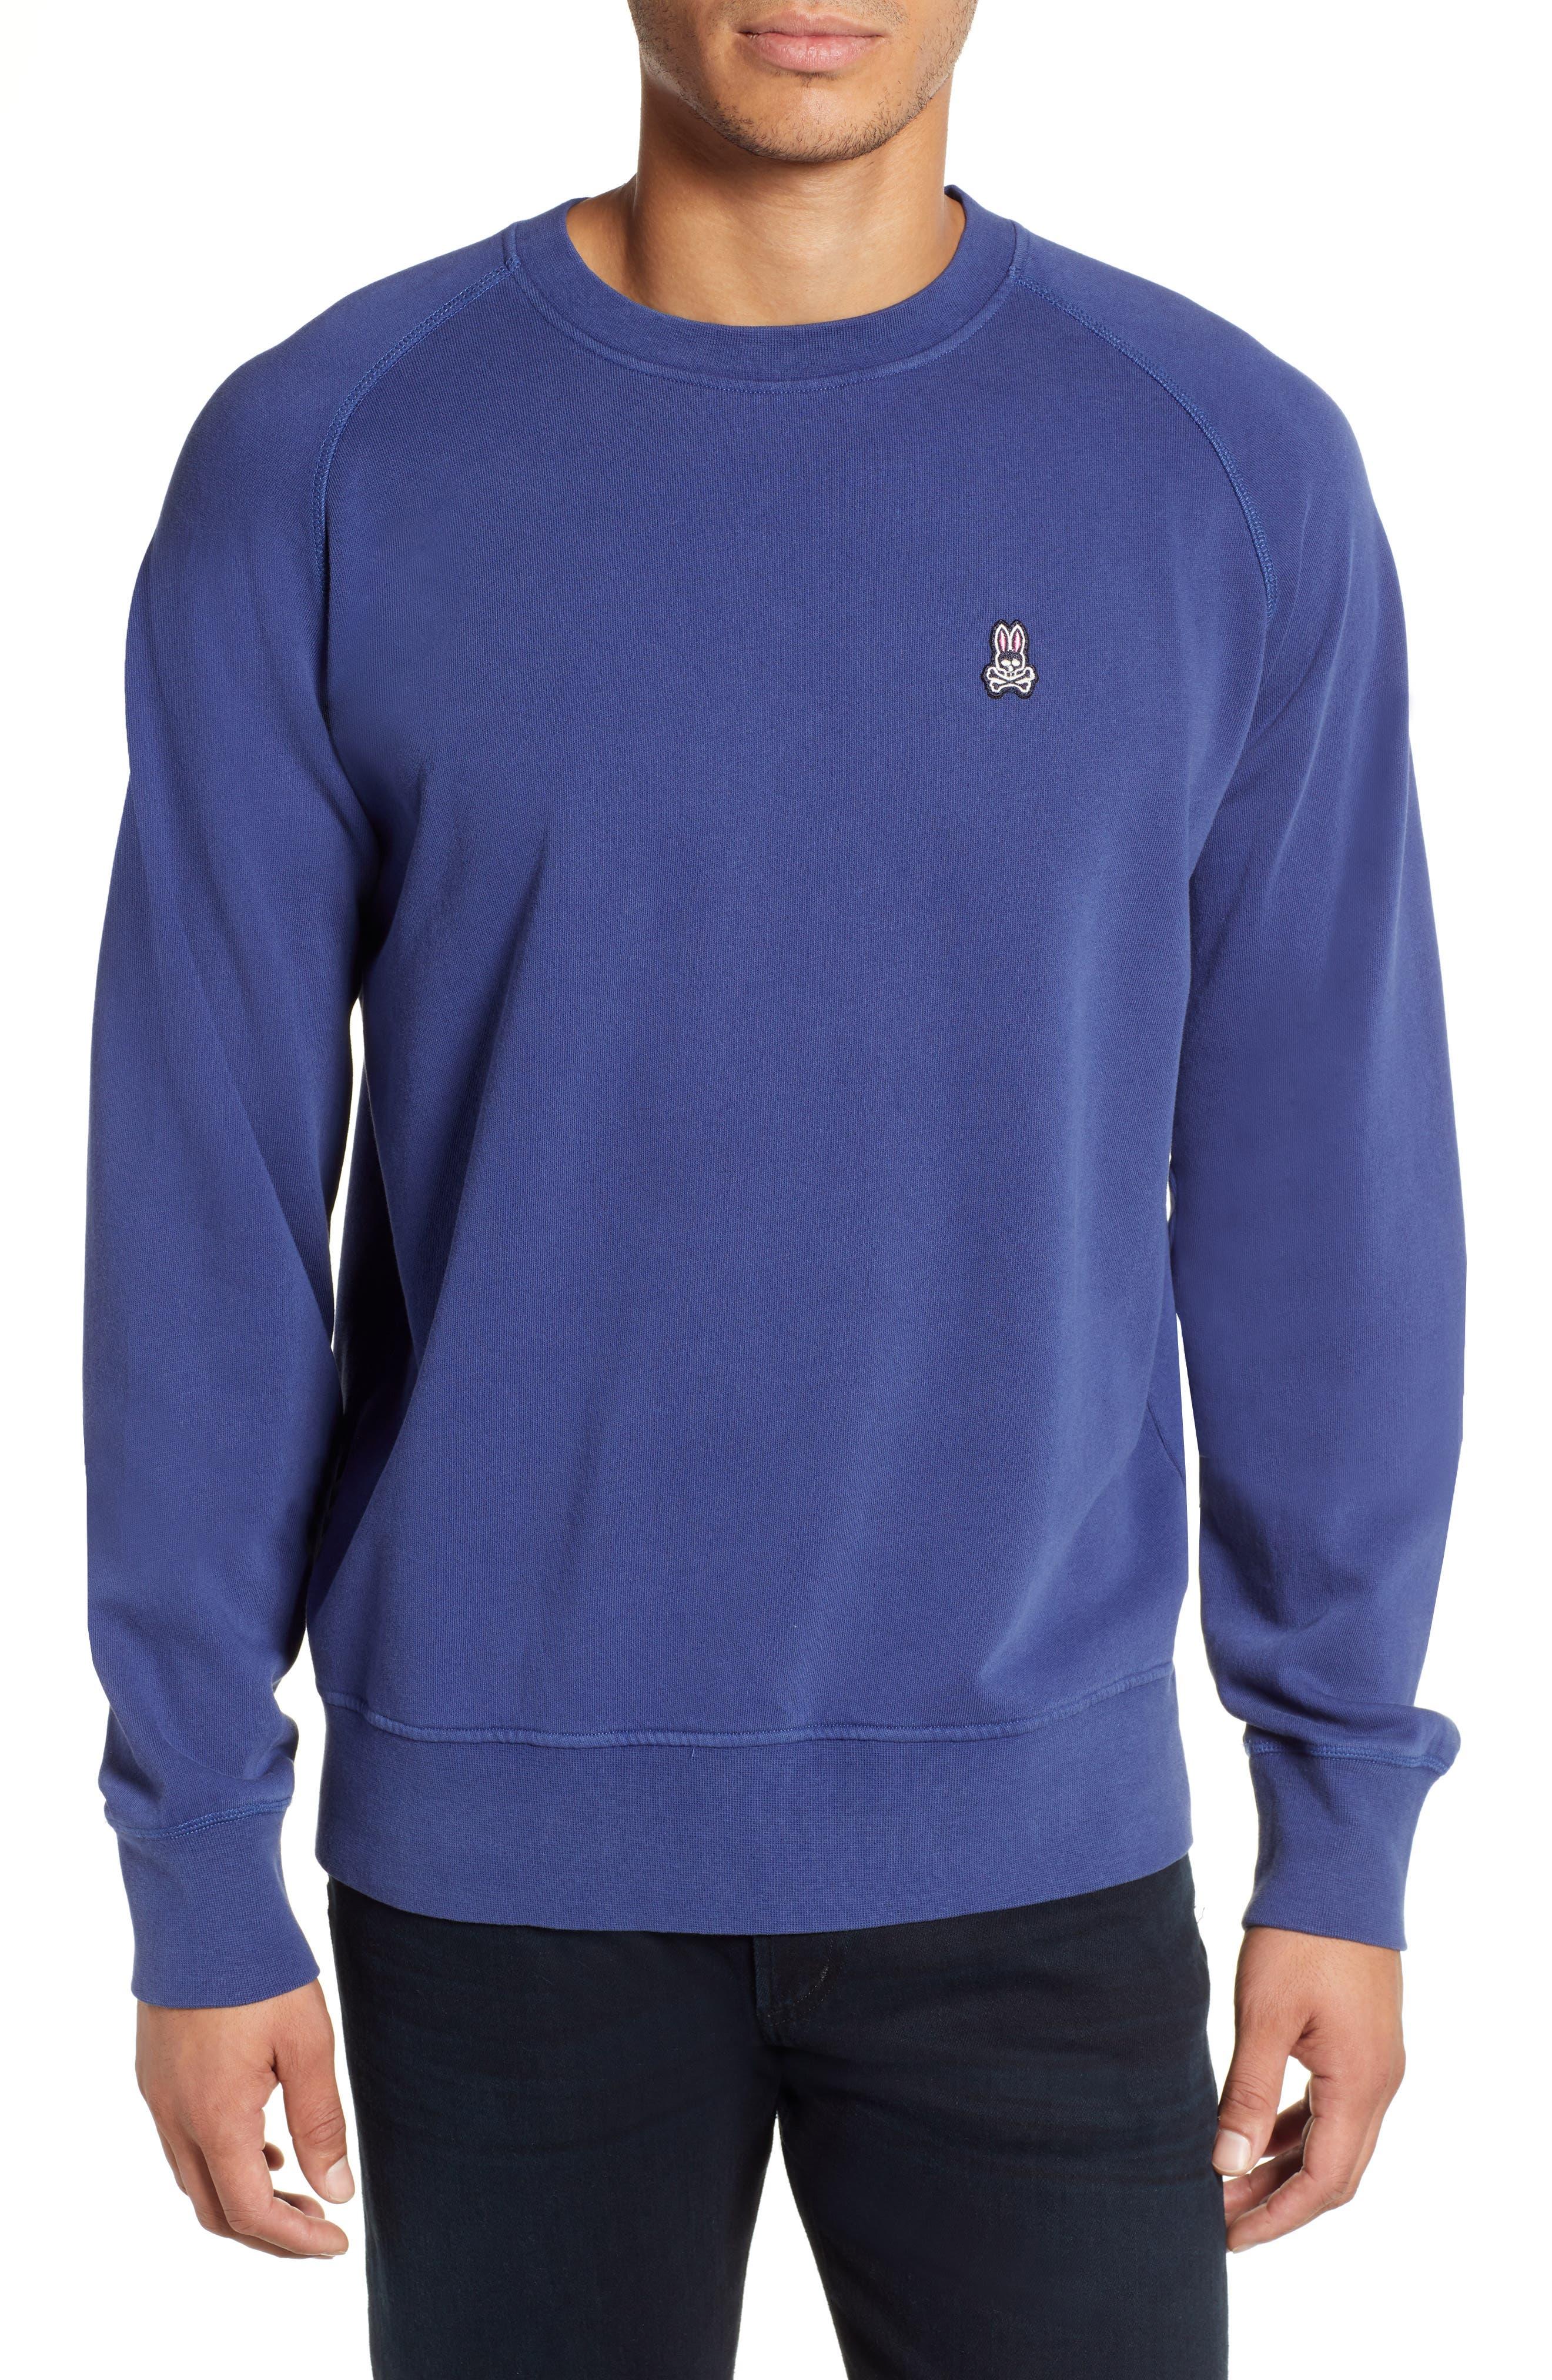 Dunham Crewneck Sweatshirt,                             Main thumbnail 1, color,                             BLUE PRINT